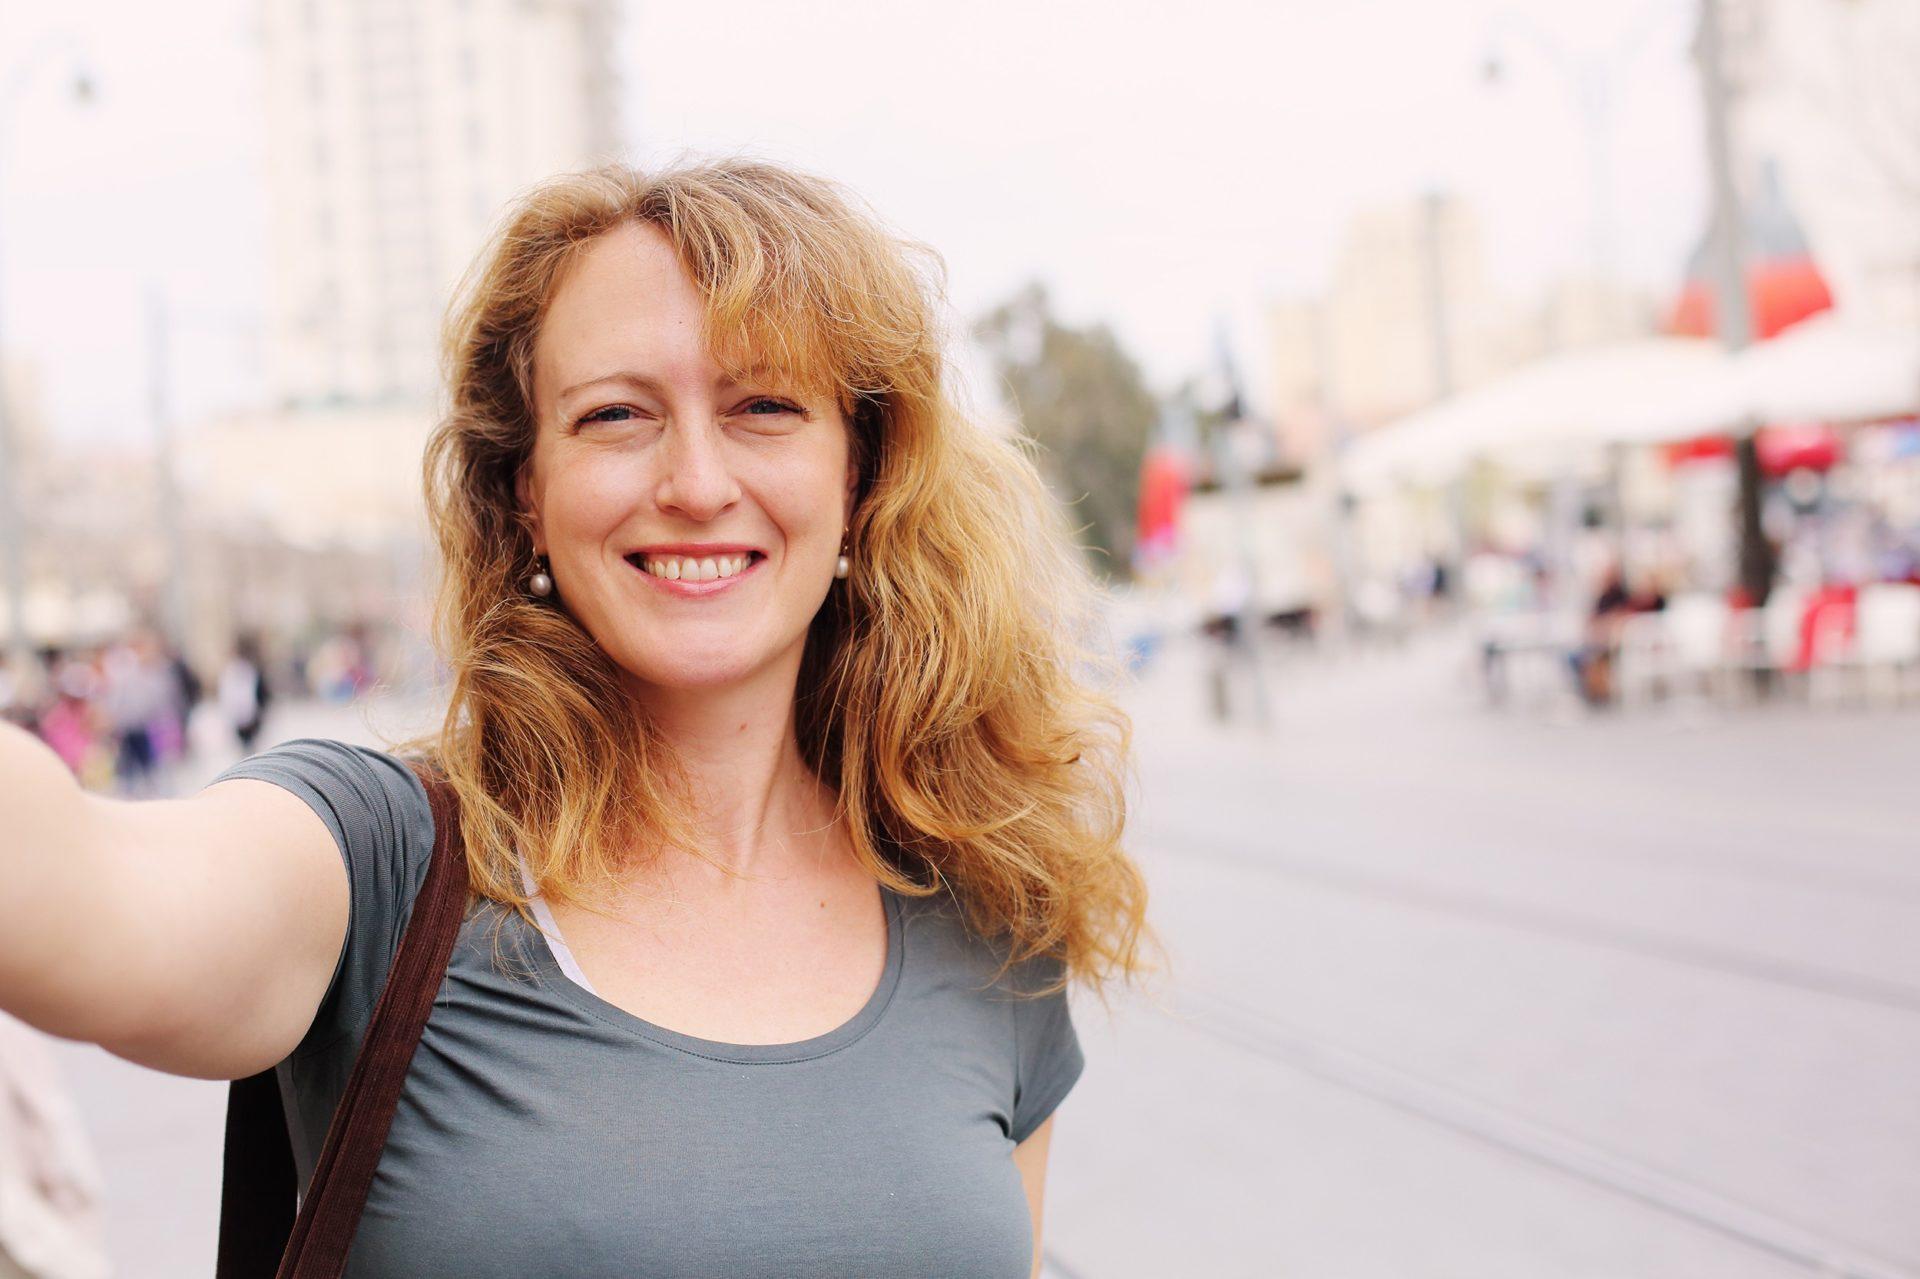 dieta para bajar de peso con hipertiroidismo